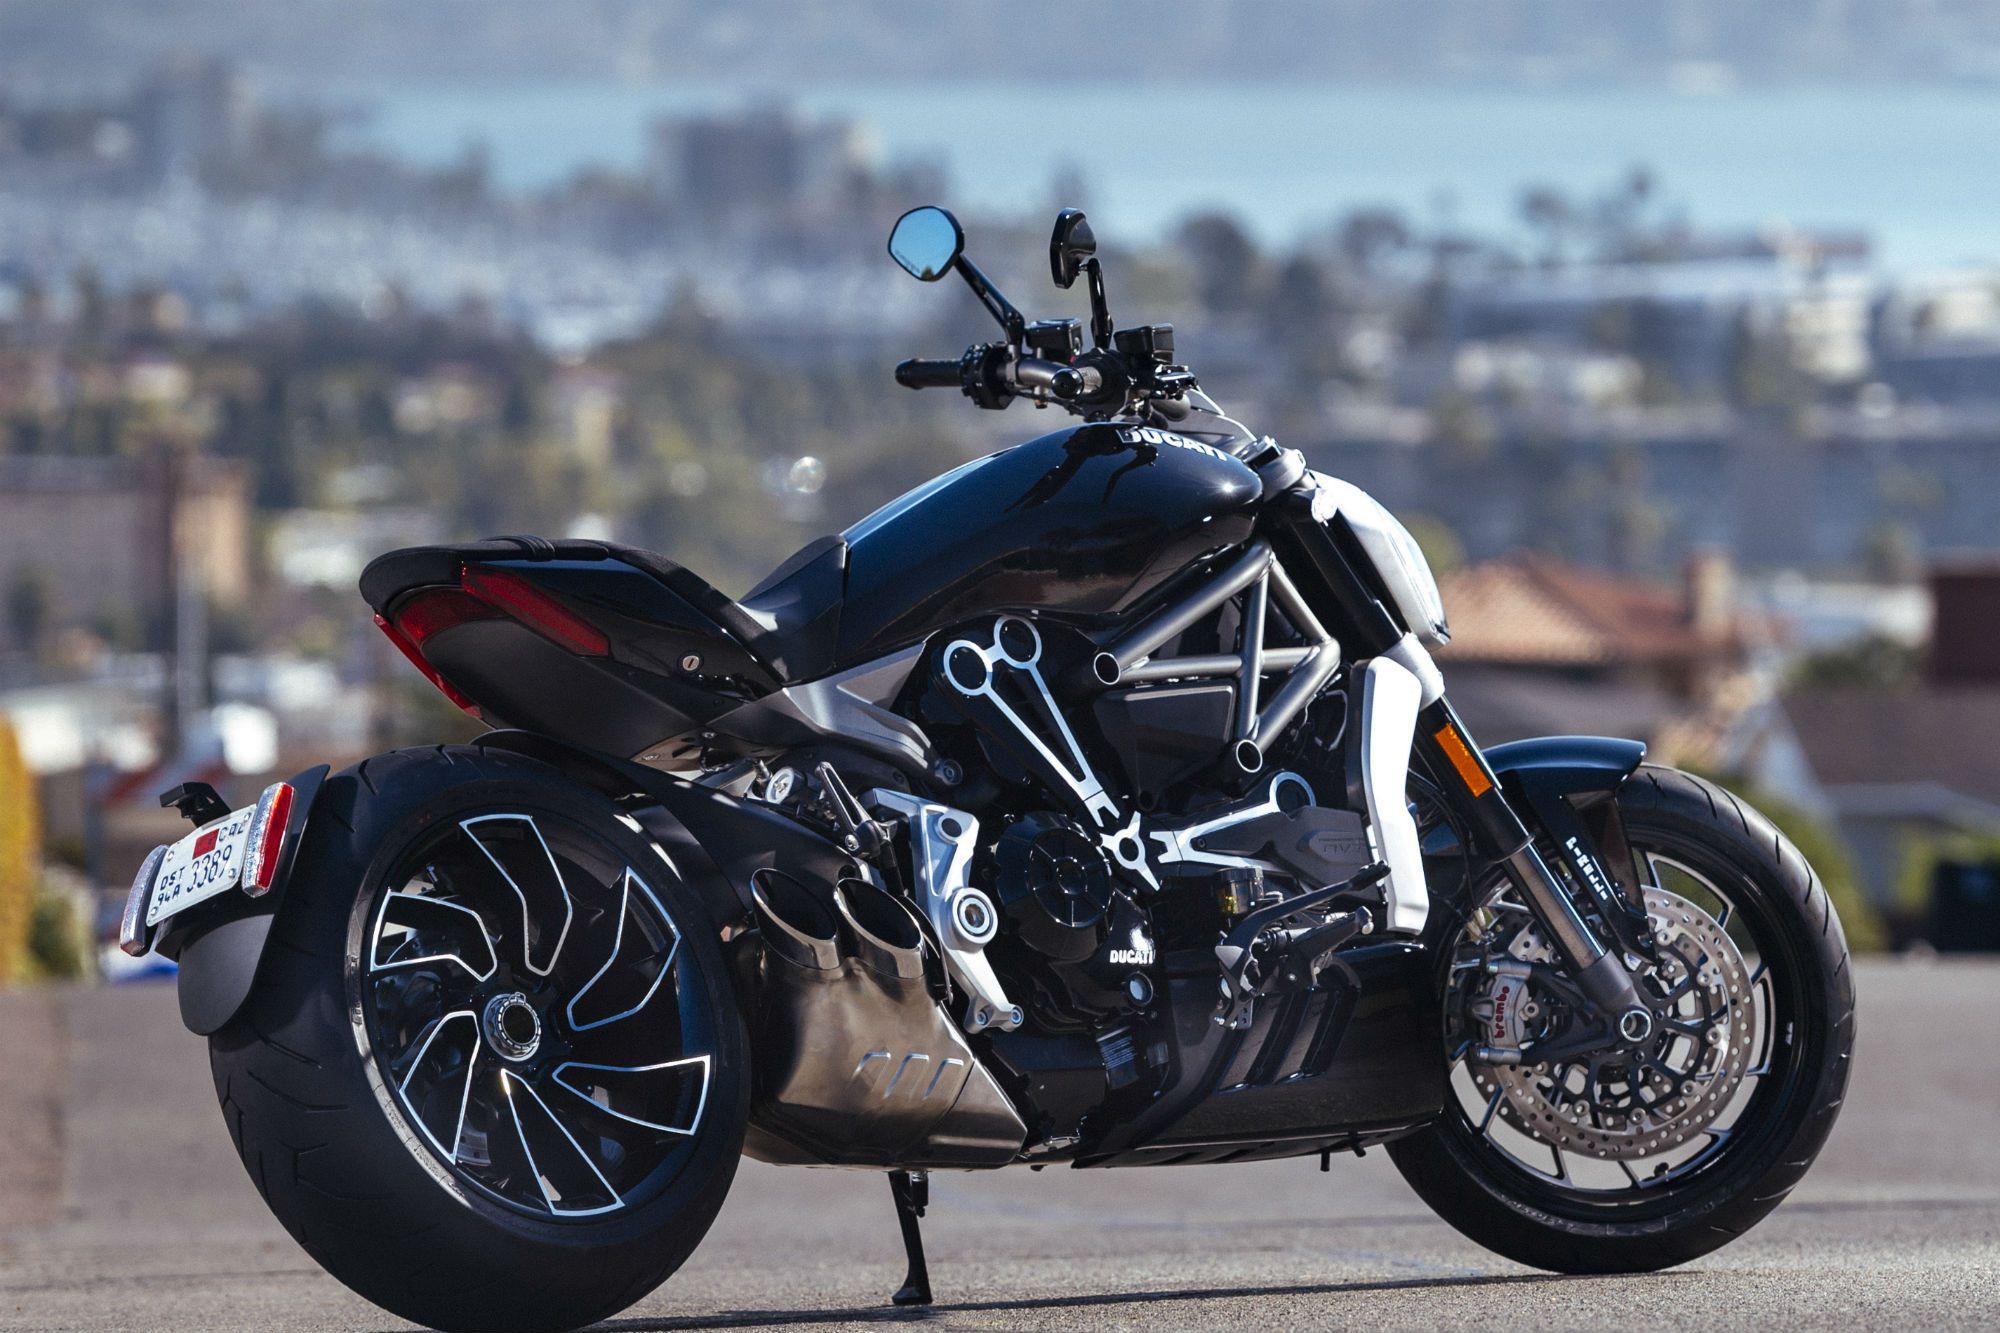 Ducati XDiavel S wins design award